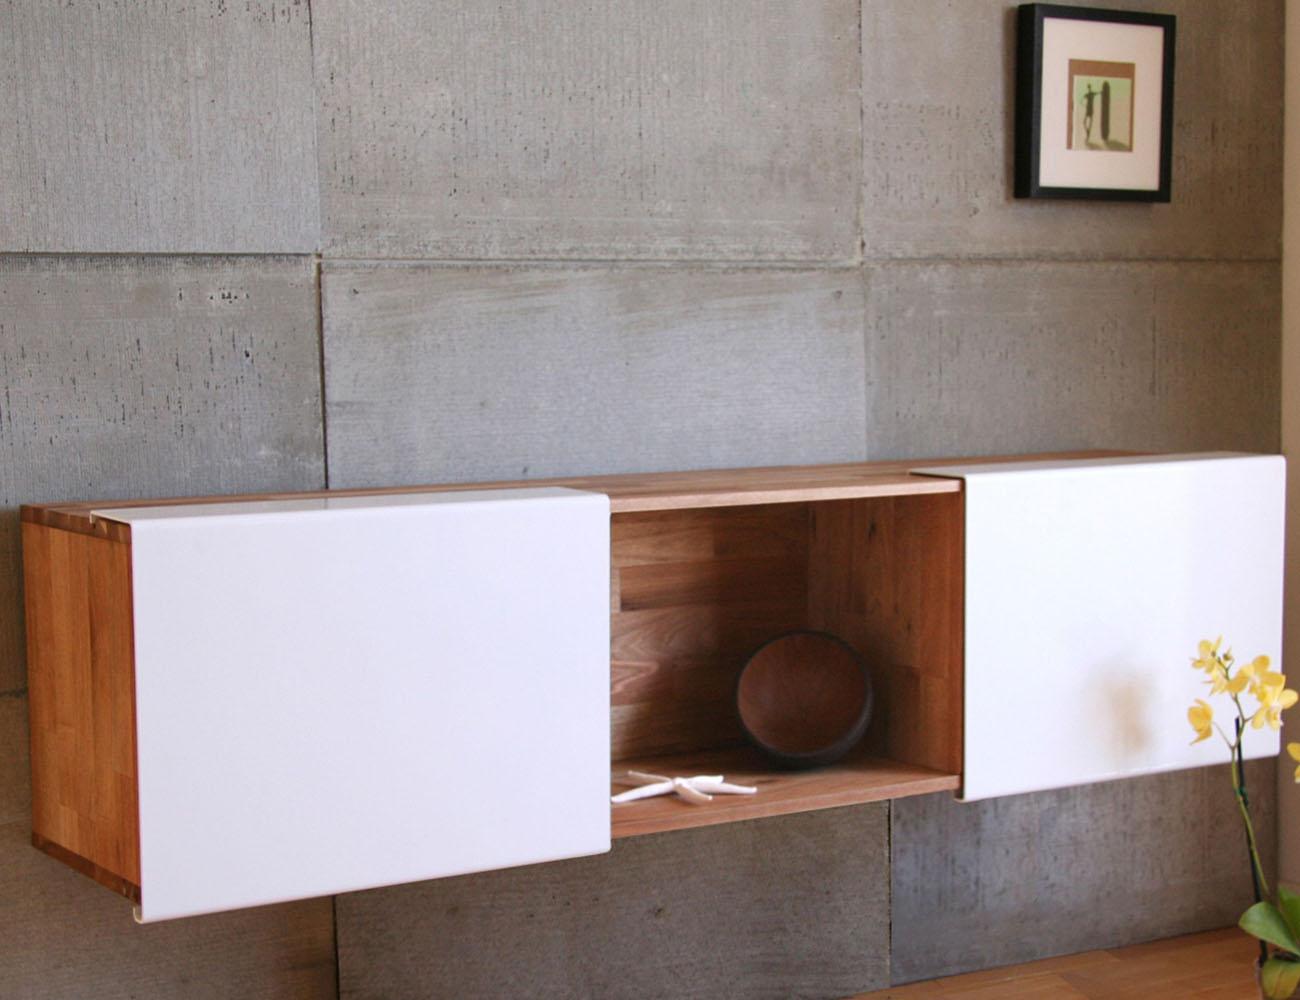 LAX Series Floating Wall Shelf by MASH Studios